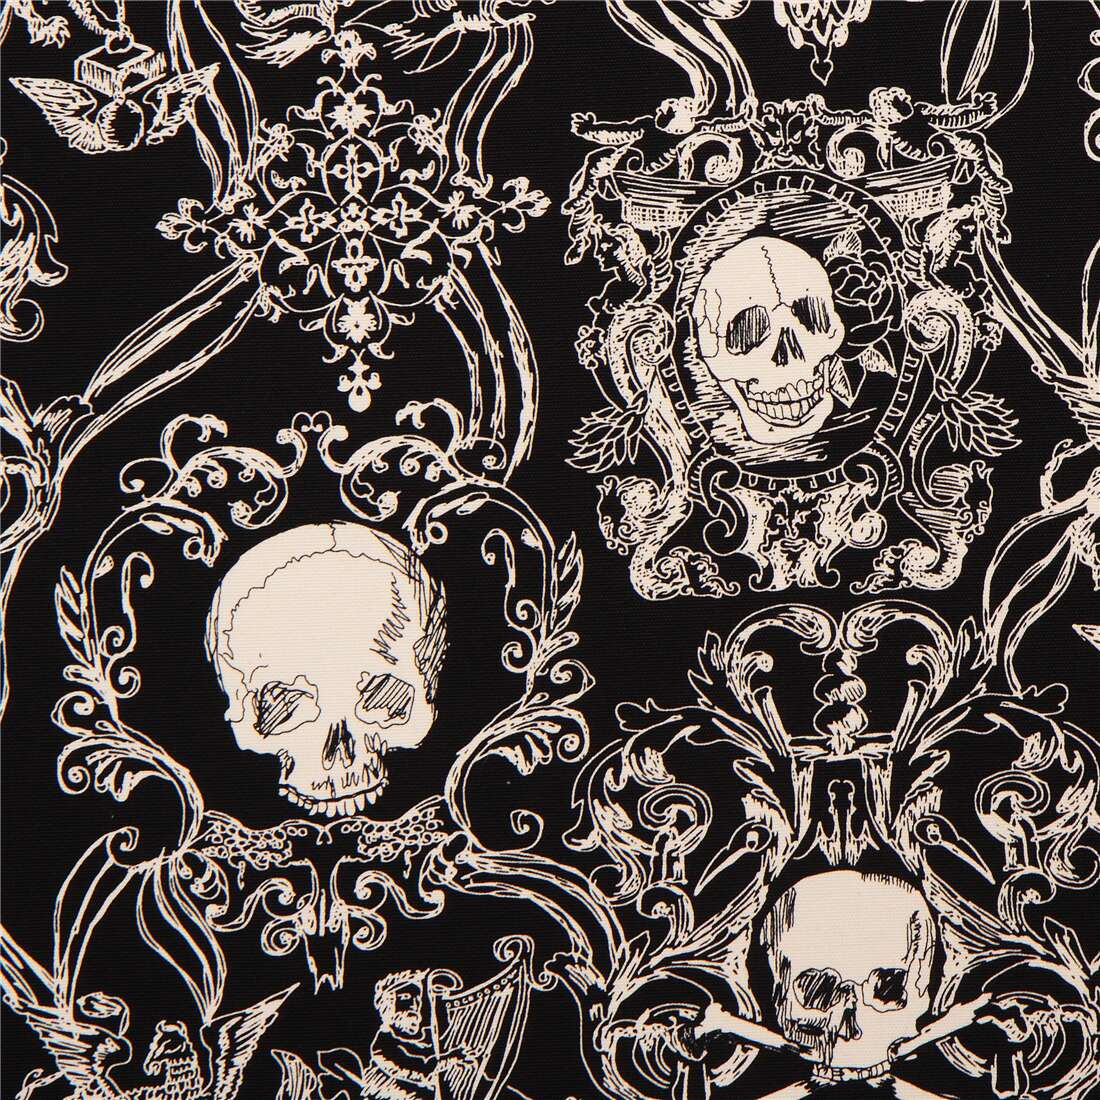 Cotton skulls cream-colored